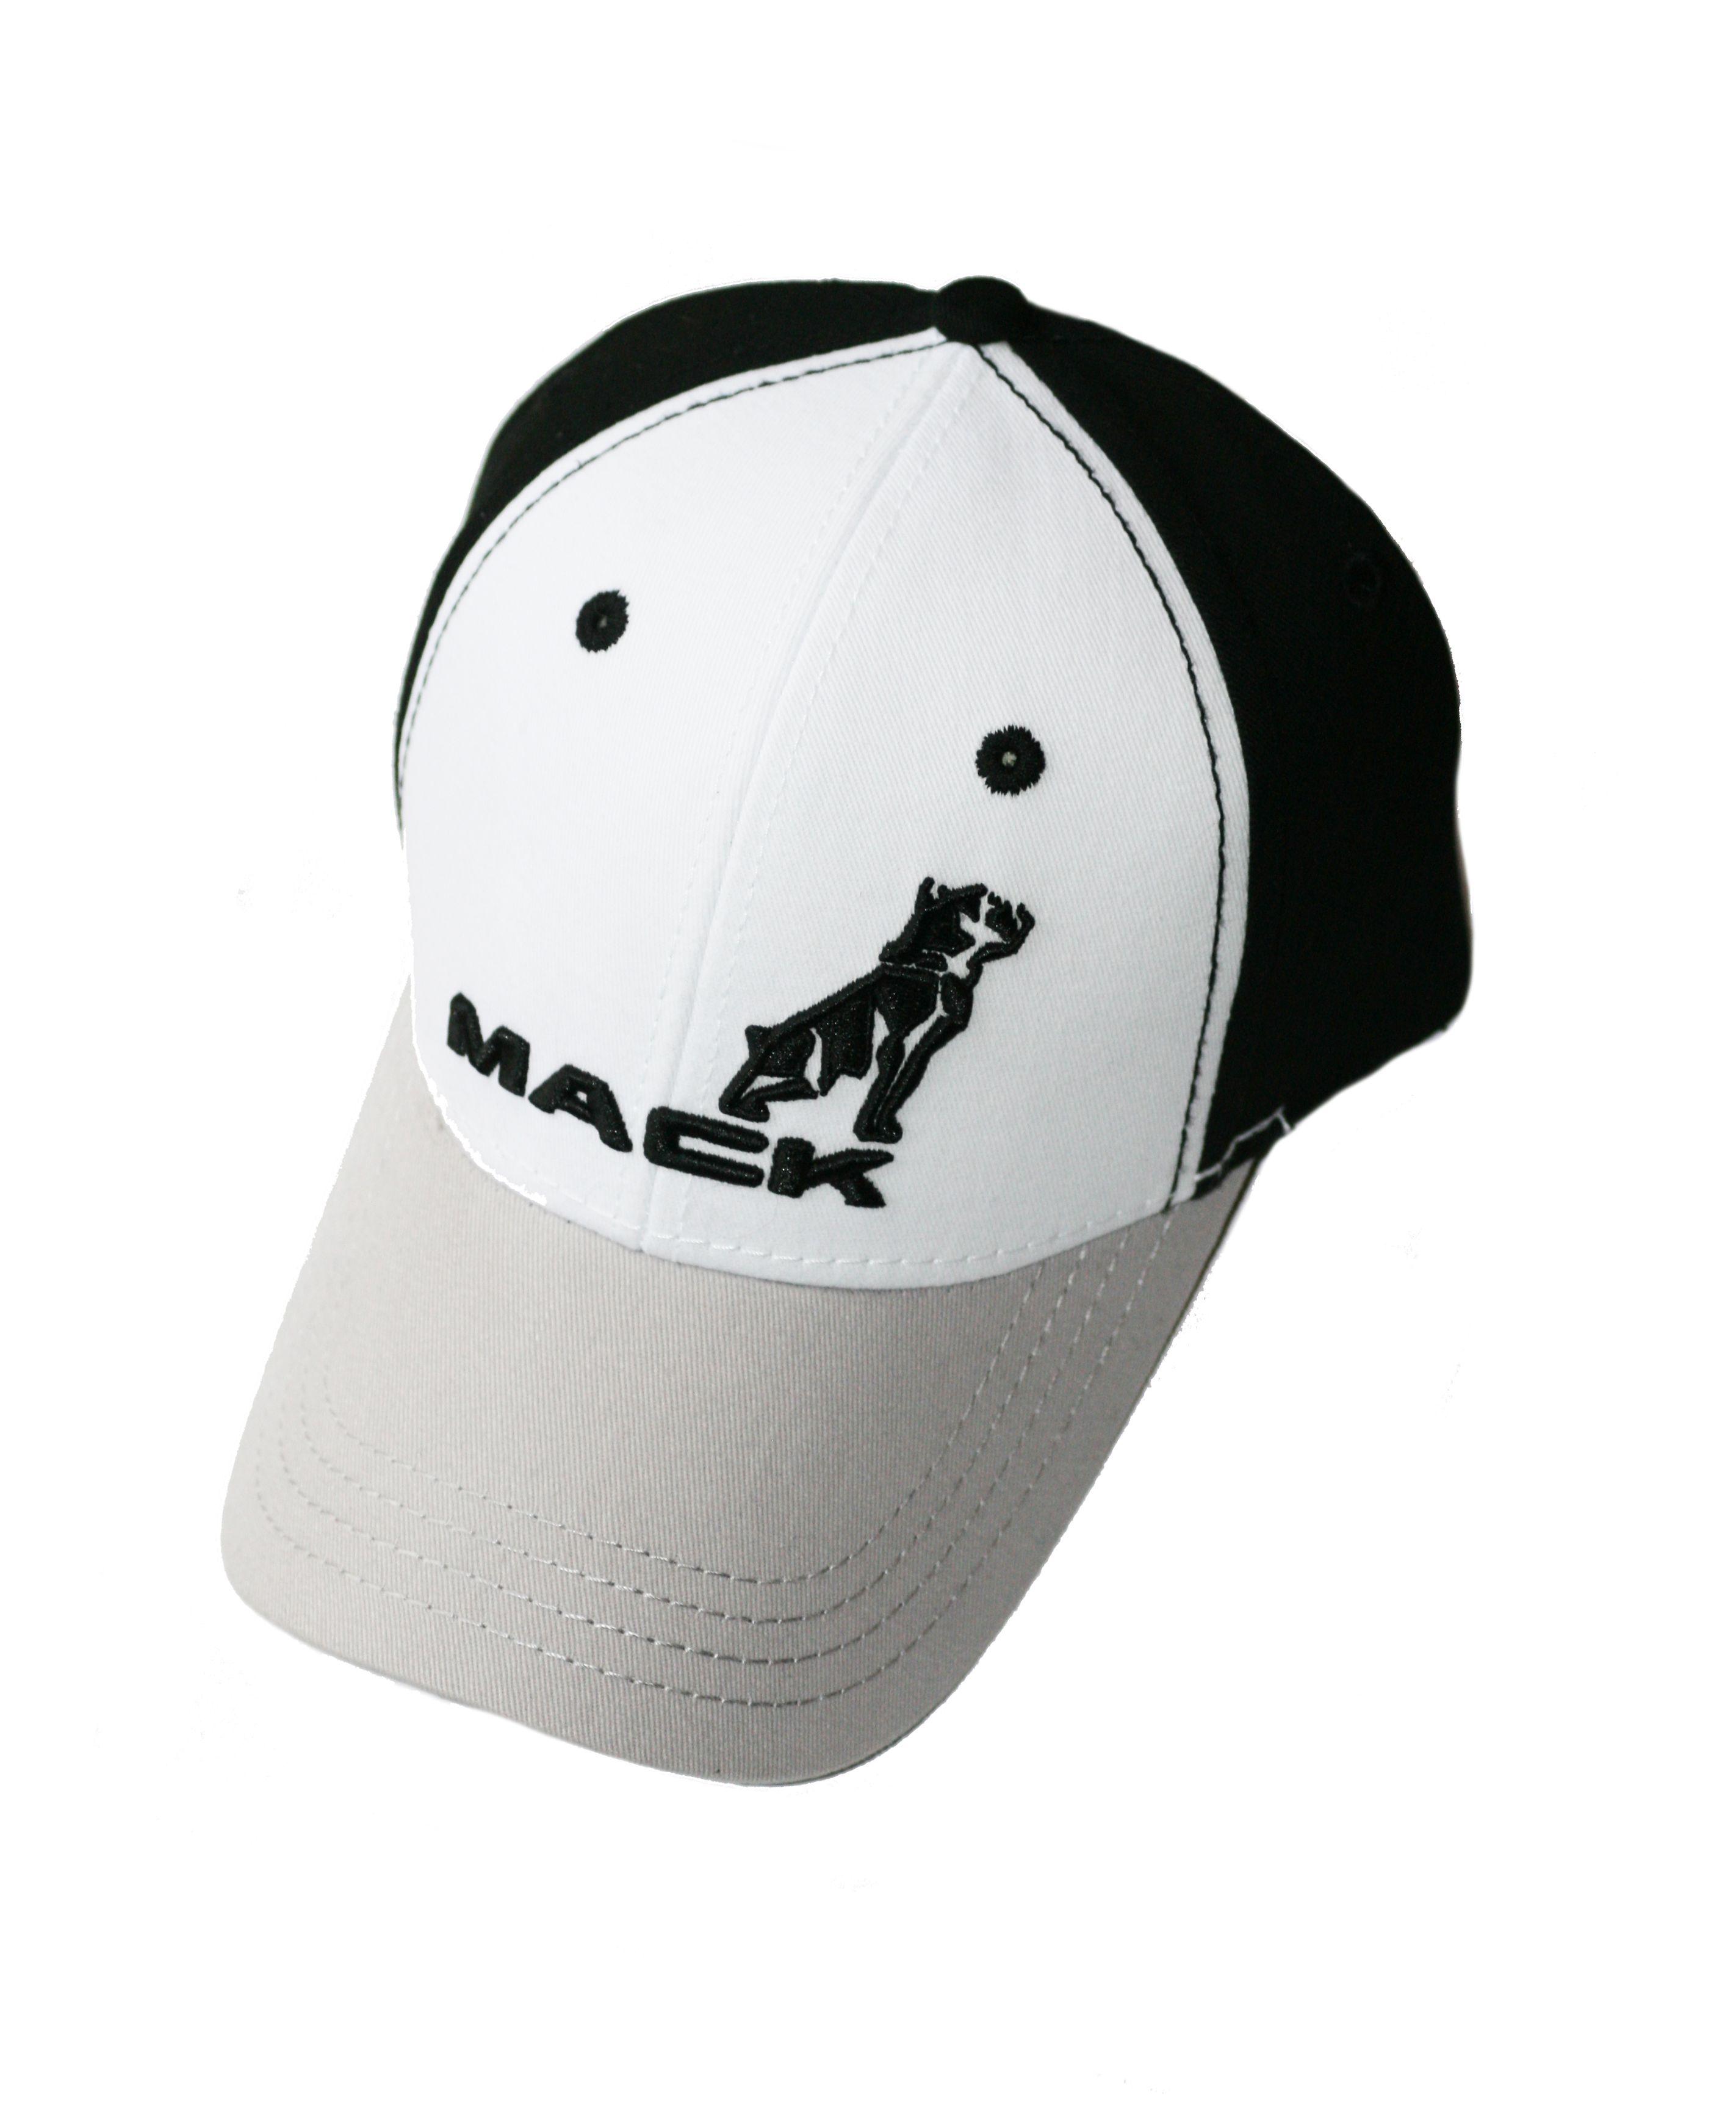 eecad7448987d Mack Truck Merchandise - Mack Truck Hats - Mack Trucks Black   White  Bulldog Logo Cap - Mack Trucks Black   White Bulldog Logo Caps